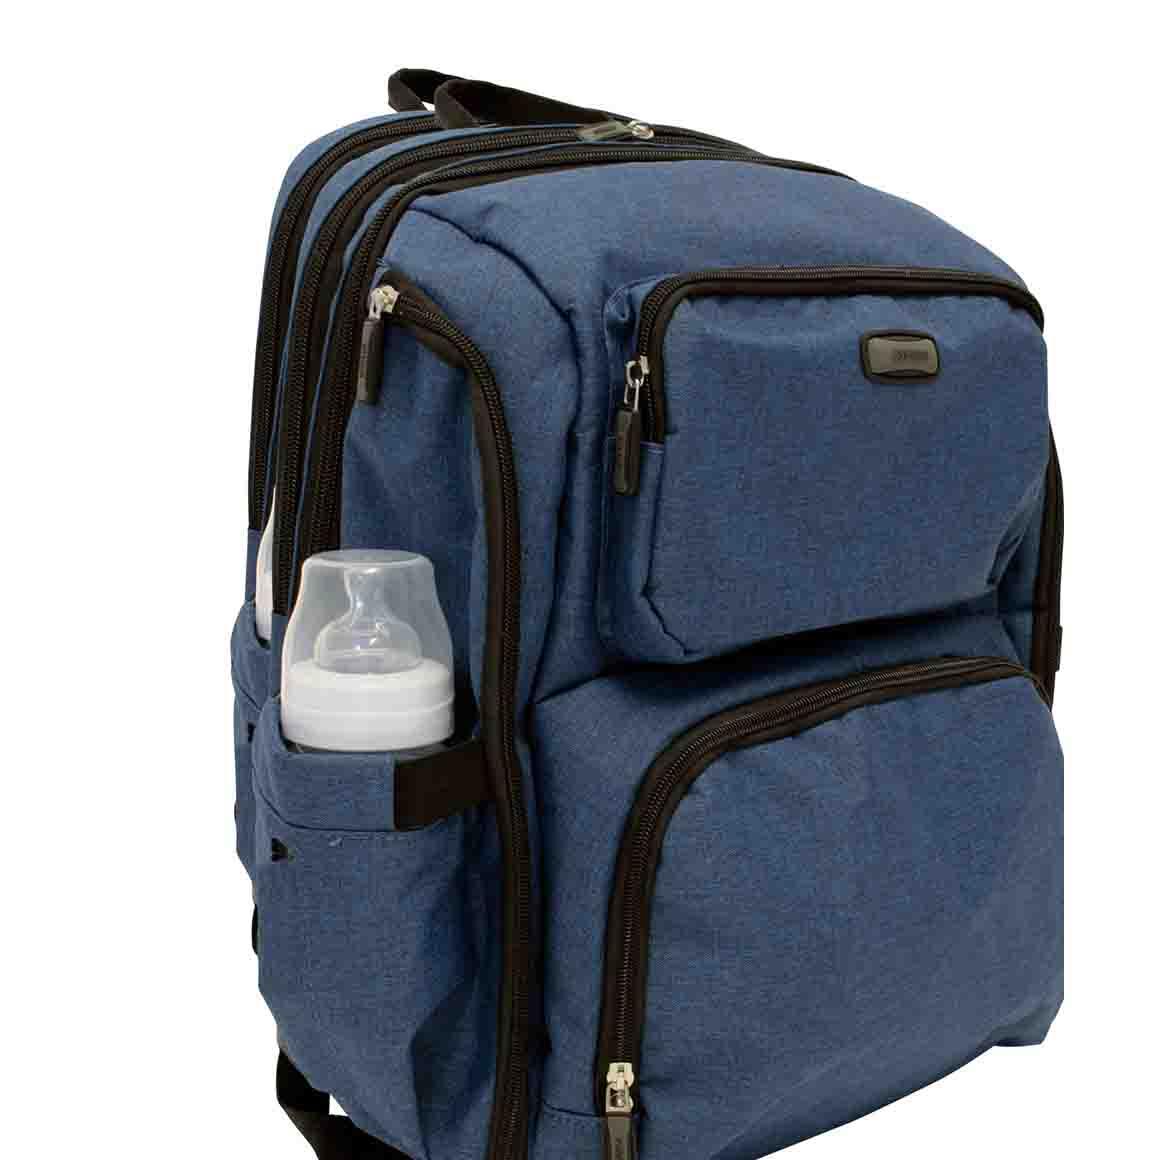 La Tasche Iconic Backpack - Blue Denim | Trada Marketplace